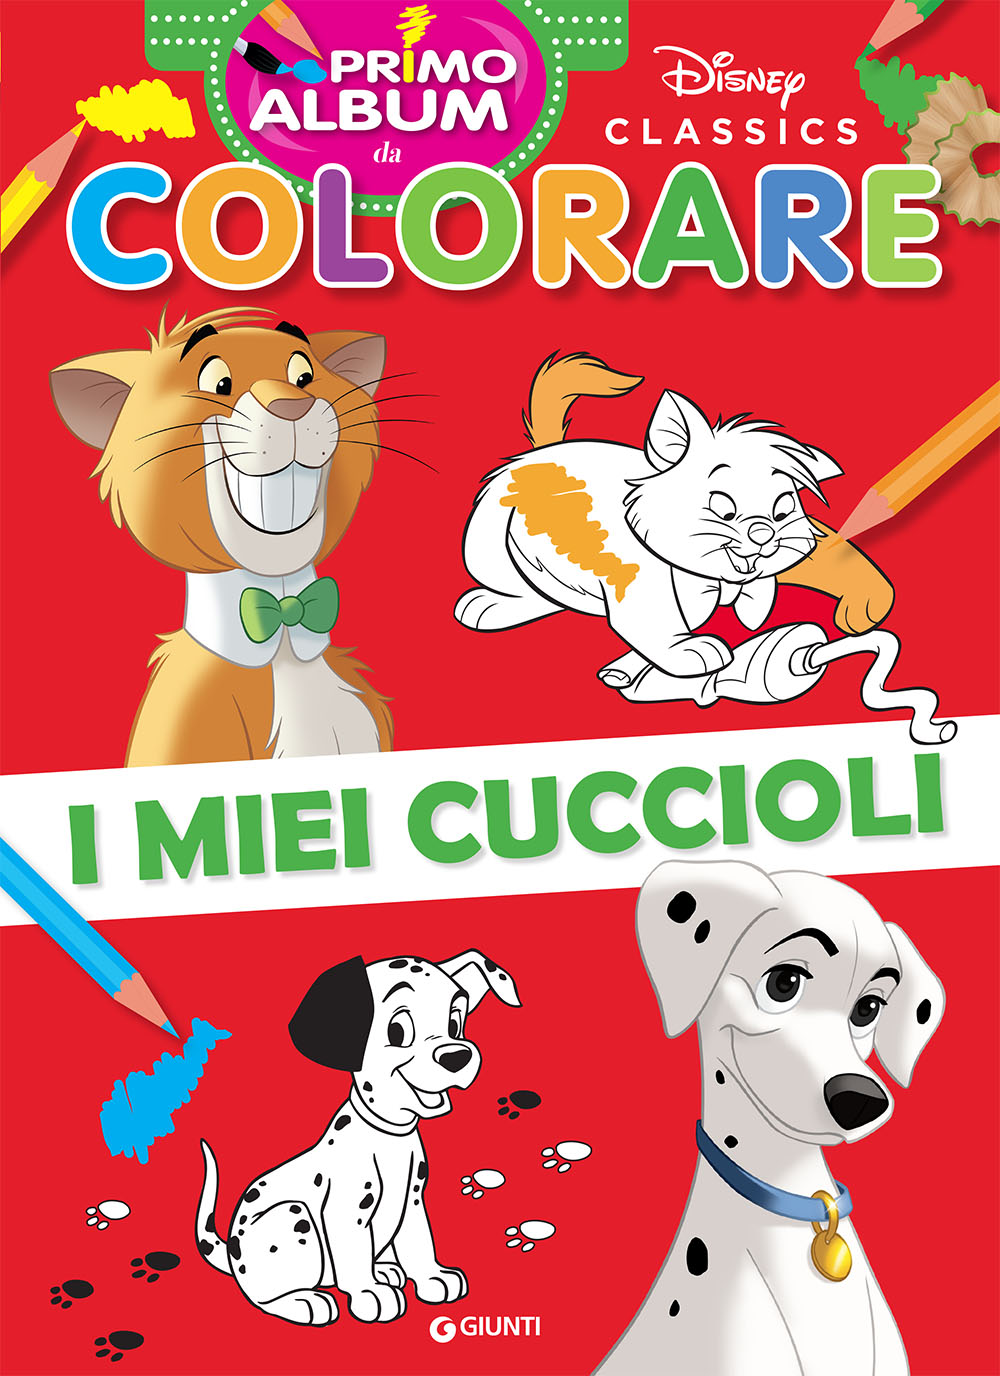 Primo album da colorare Disney Classics